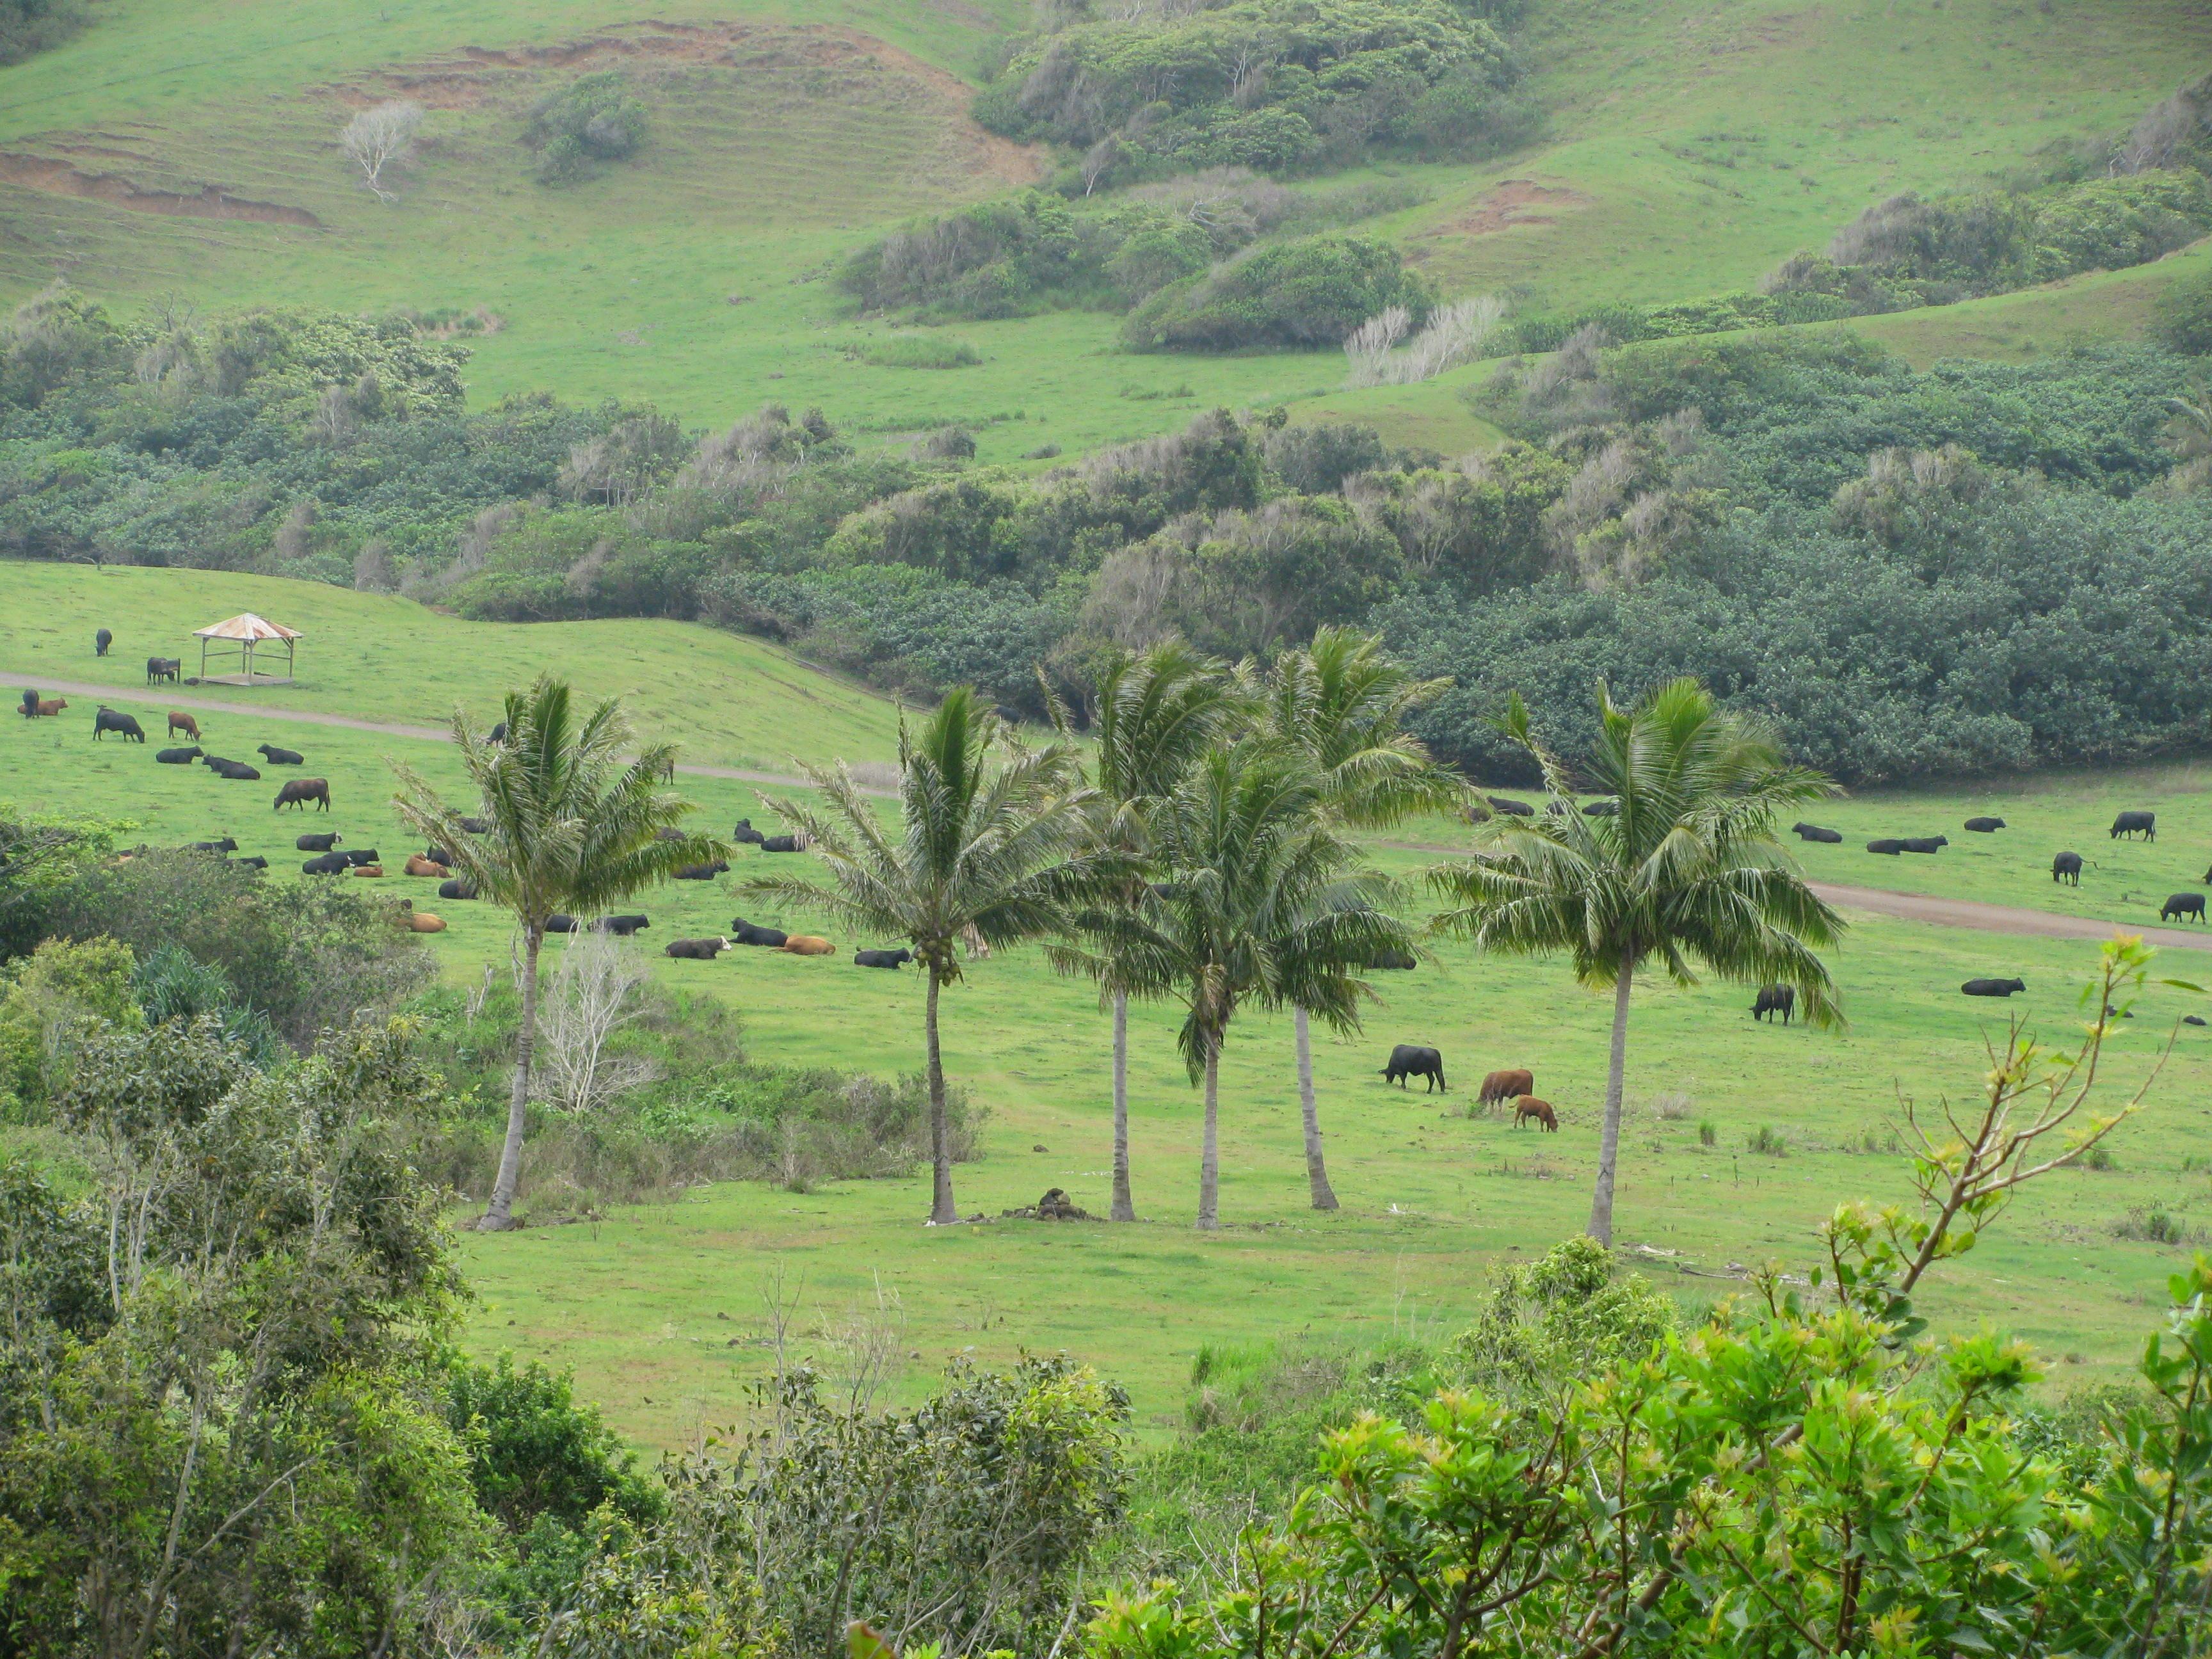 Kualoa Ranch, A Working Cattle Ranch